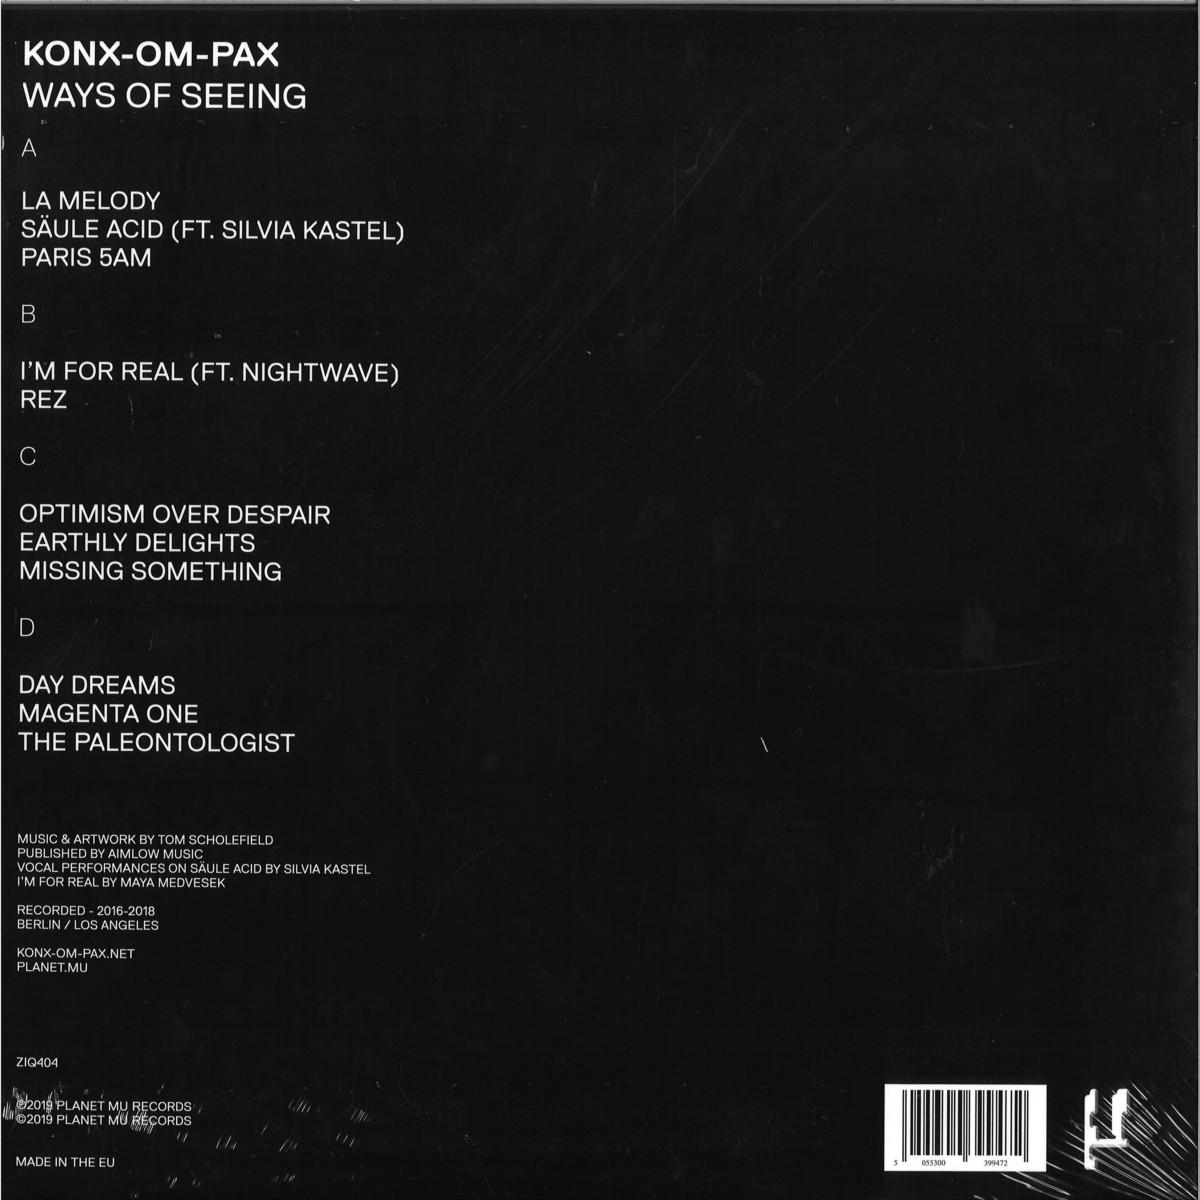 deejay de - Planet Mu Records